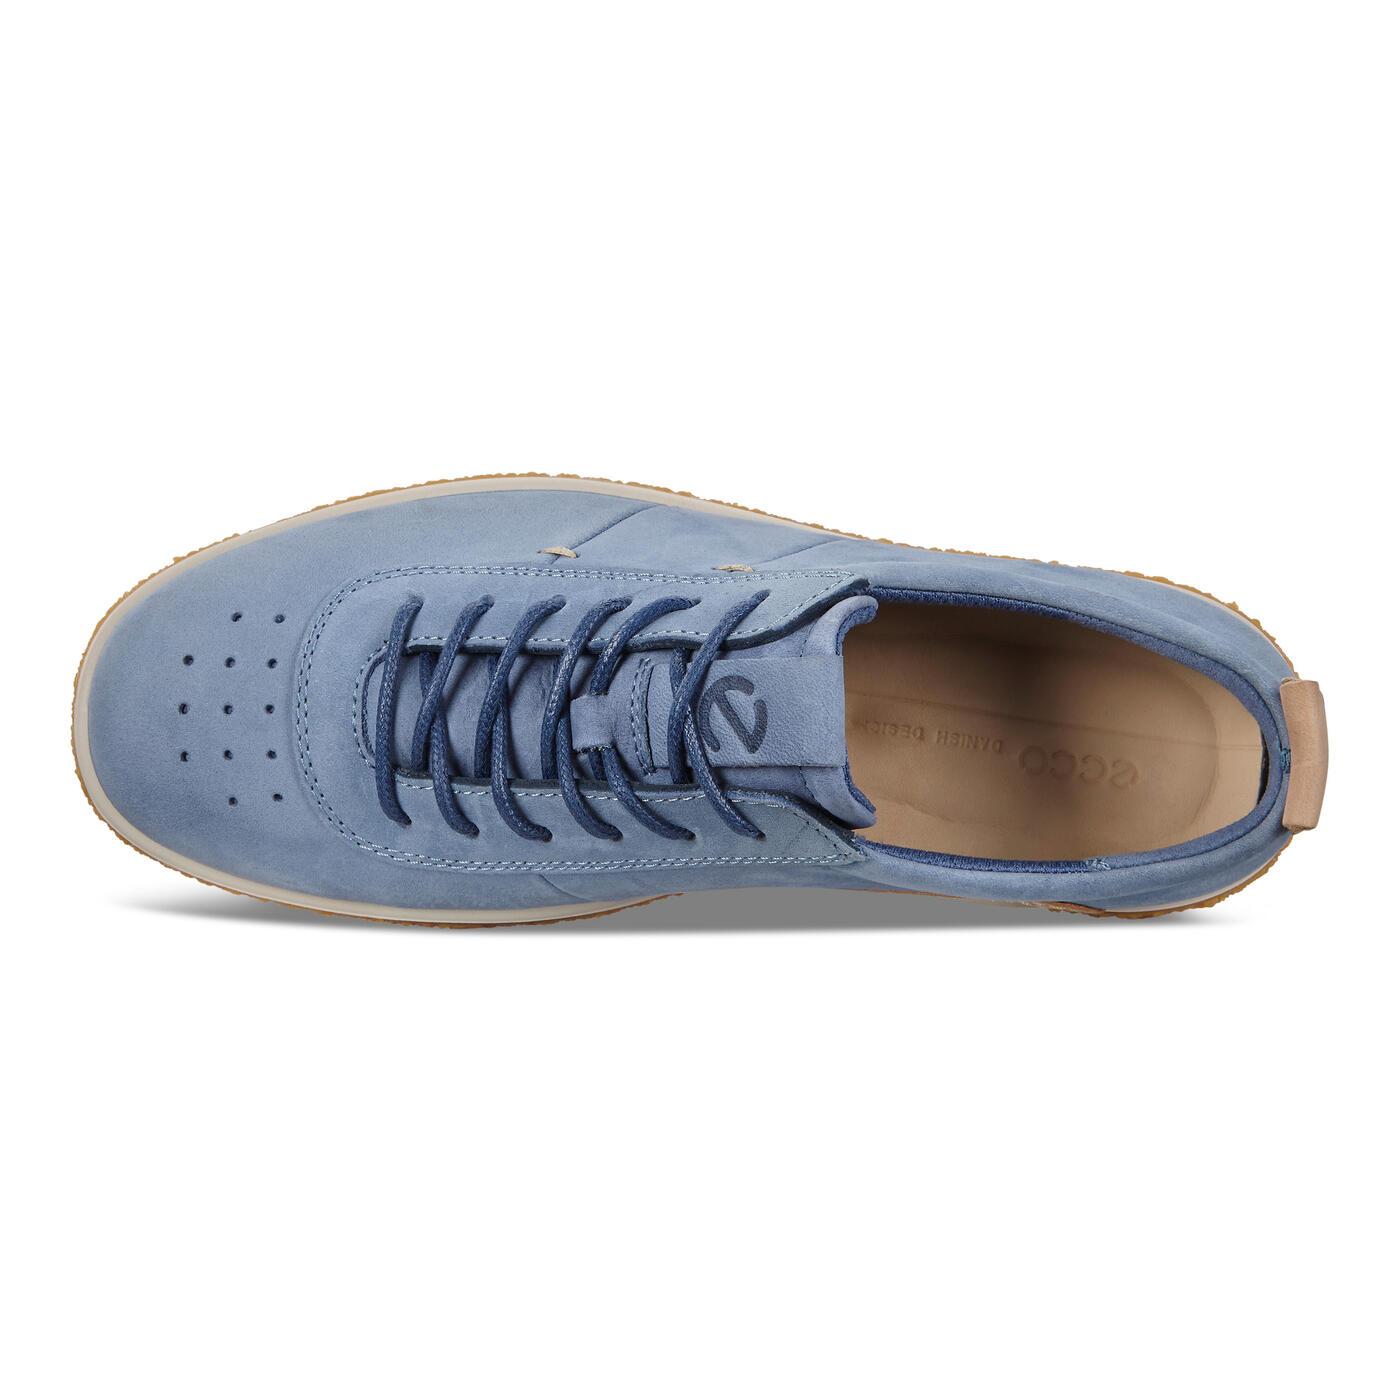 ECCO CREPETRAY Womens Sneaker